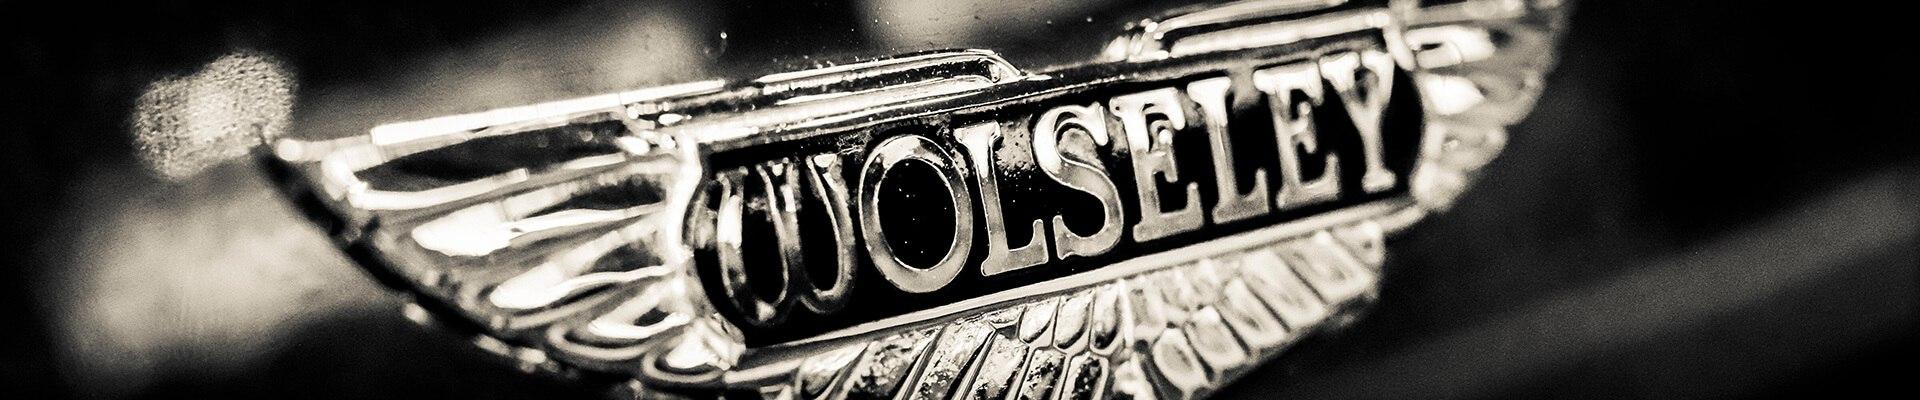 Wolseley Owners Club